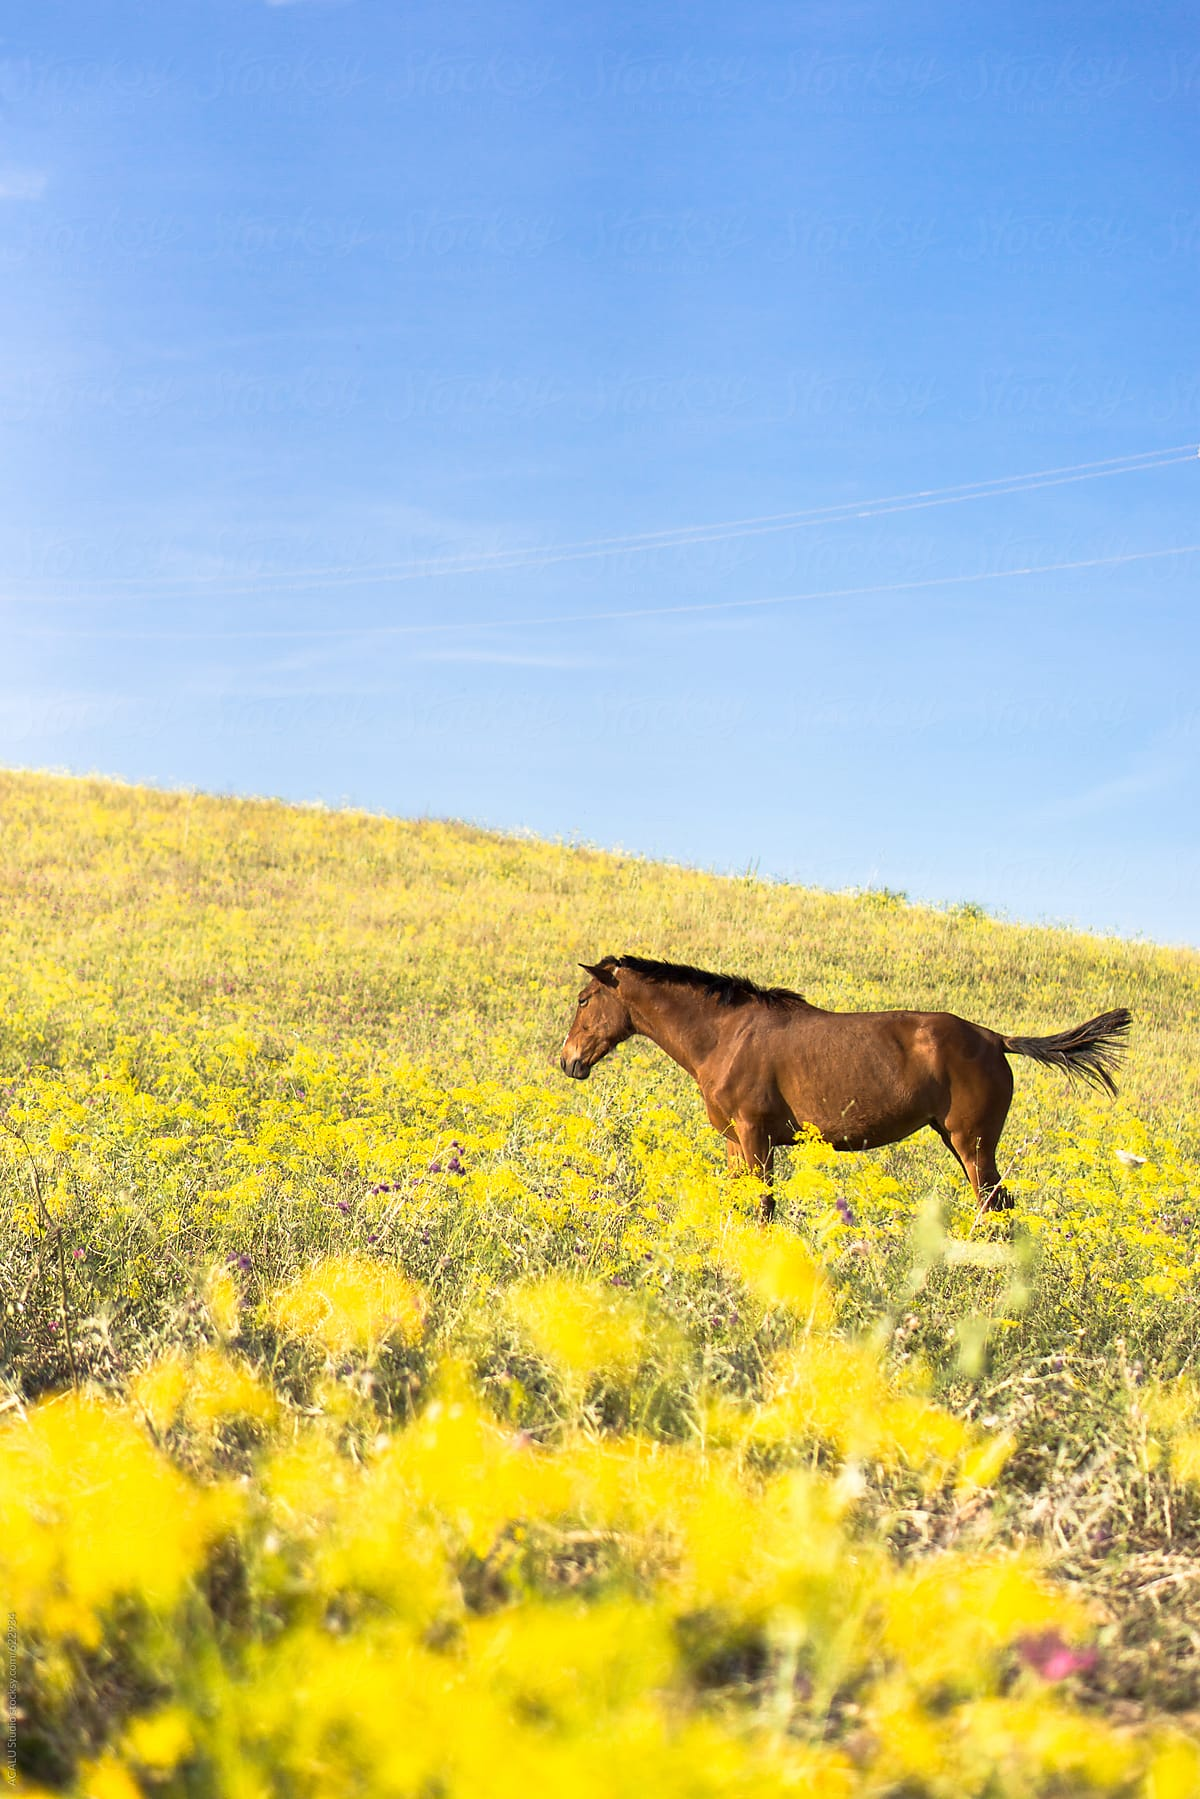 Horse Grazing In Field Of Yellow Flowers Stocksy United